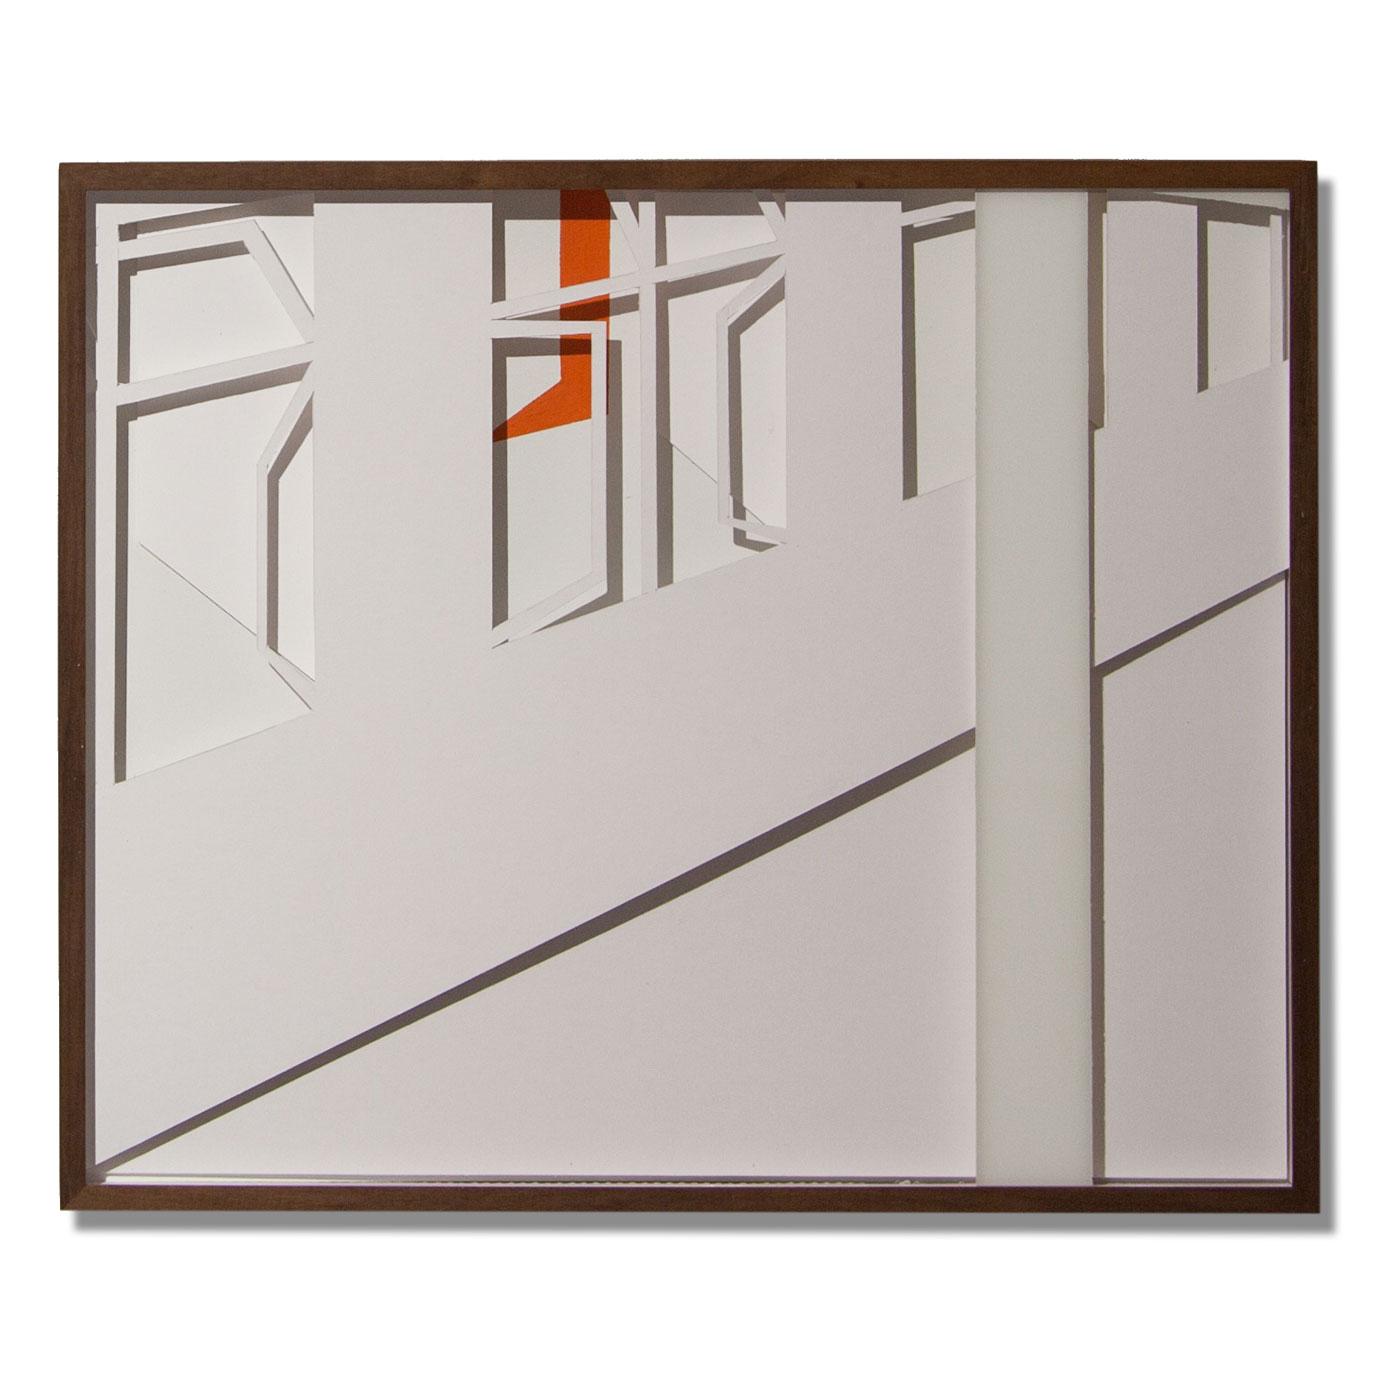 VASISTATS IV, © 2015, cardboard and acrylic paint behind glass, each 64 x 53 x 4.5 cm